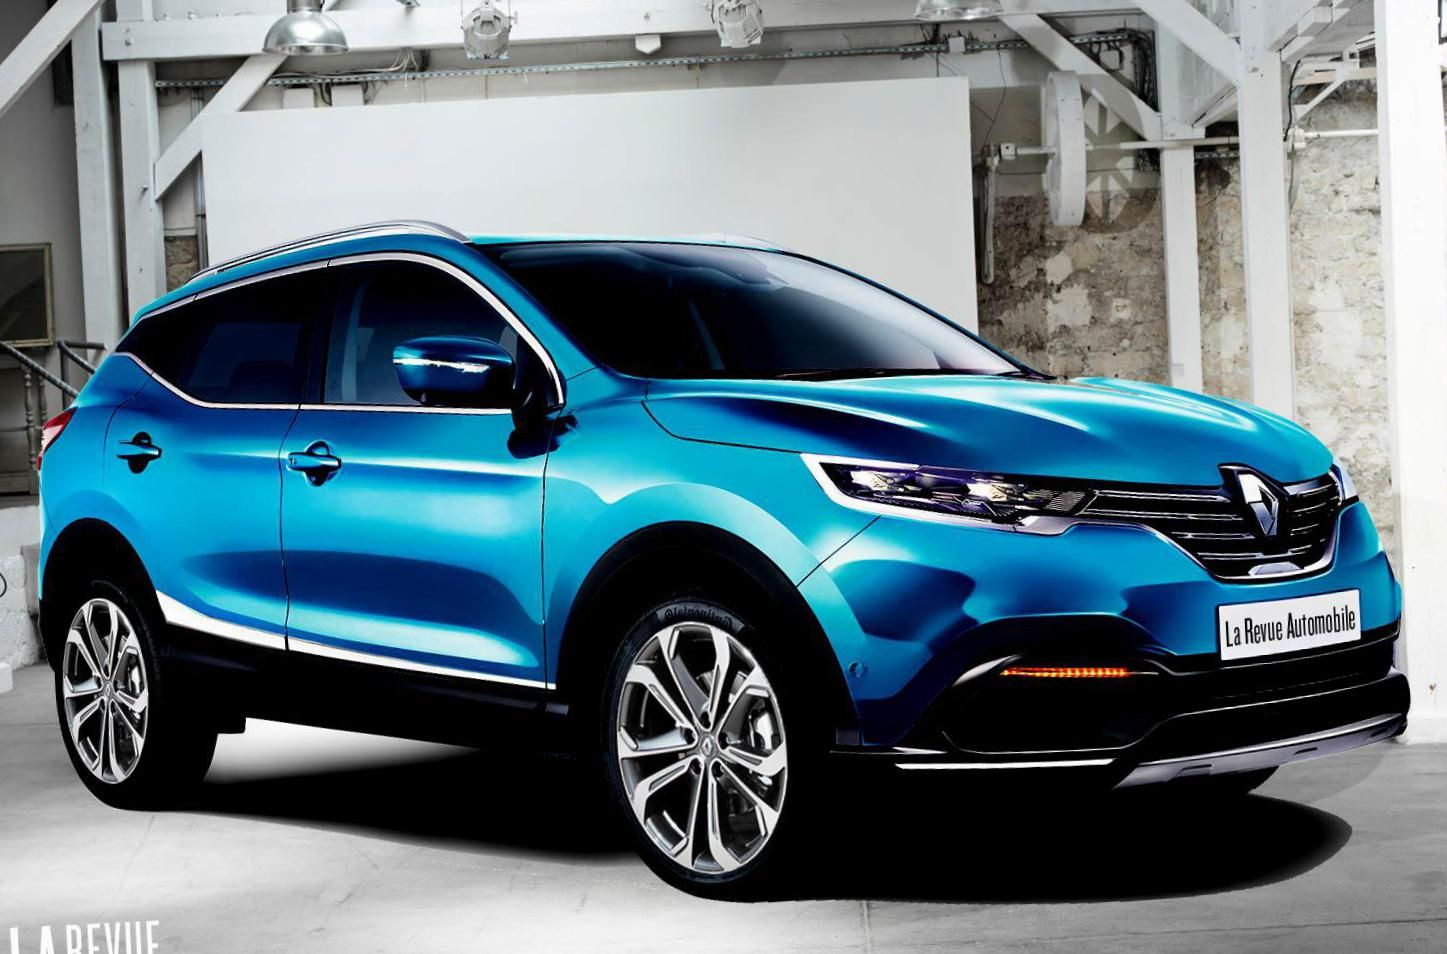 Renault Kadjar Tuning Http Autotras Com Renault Car Car Ford